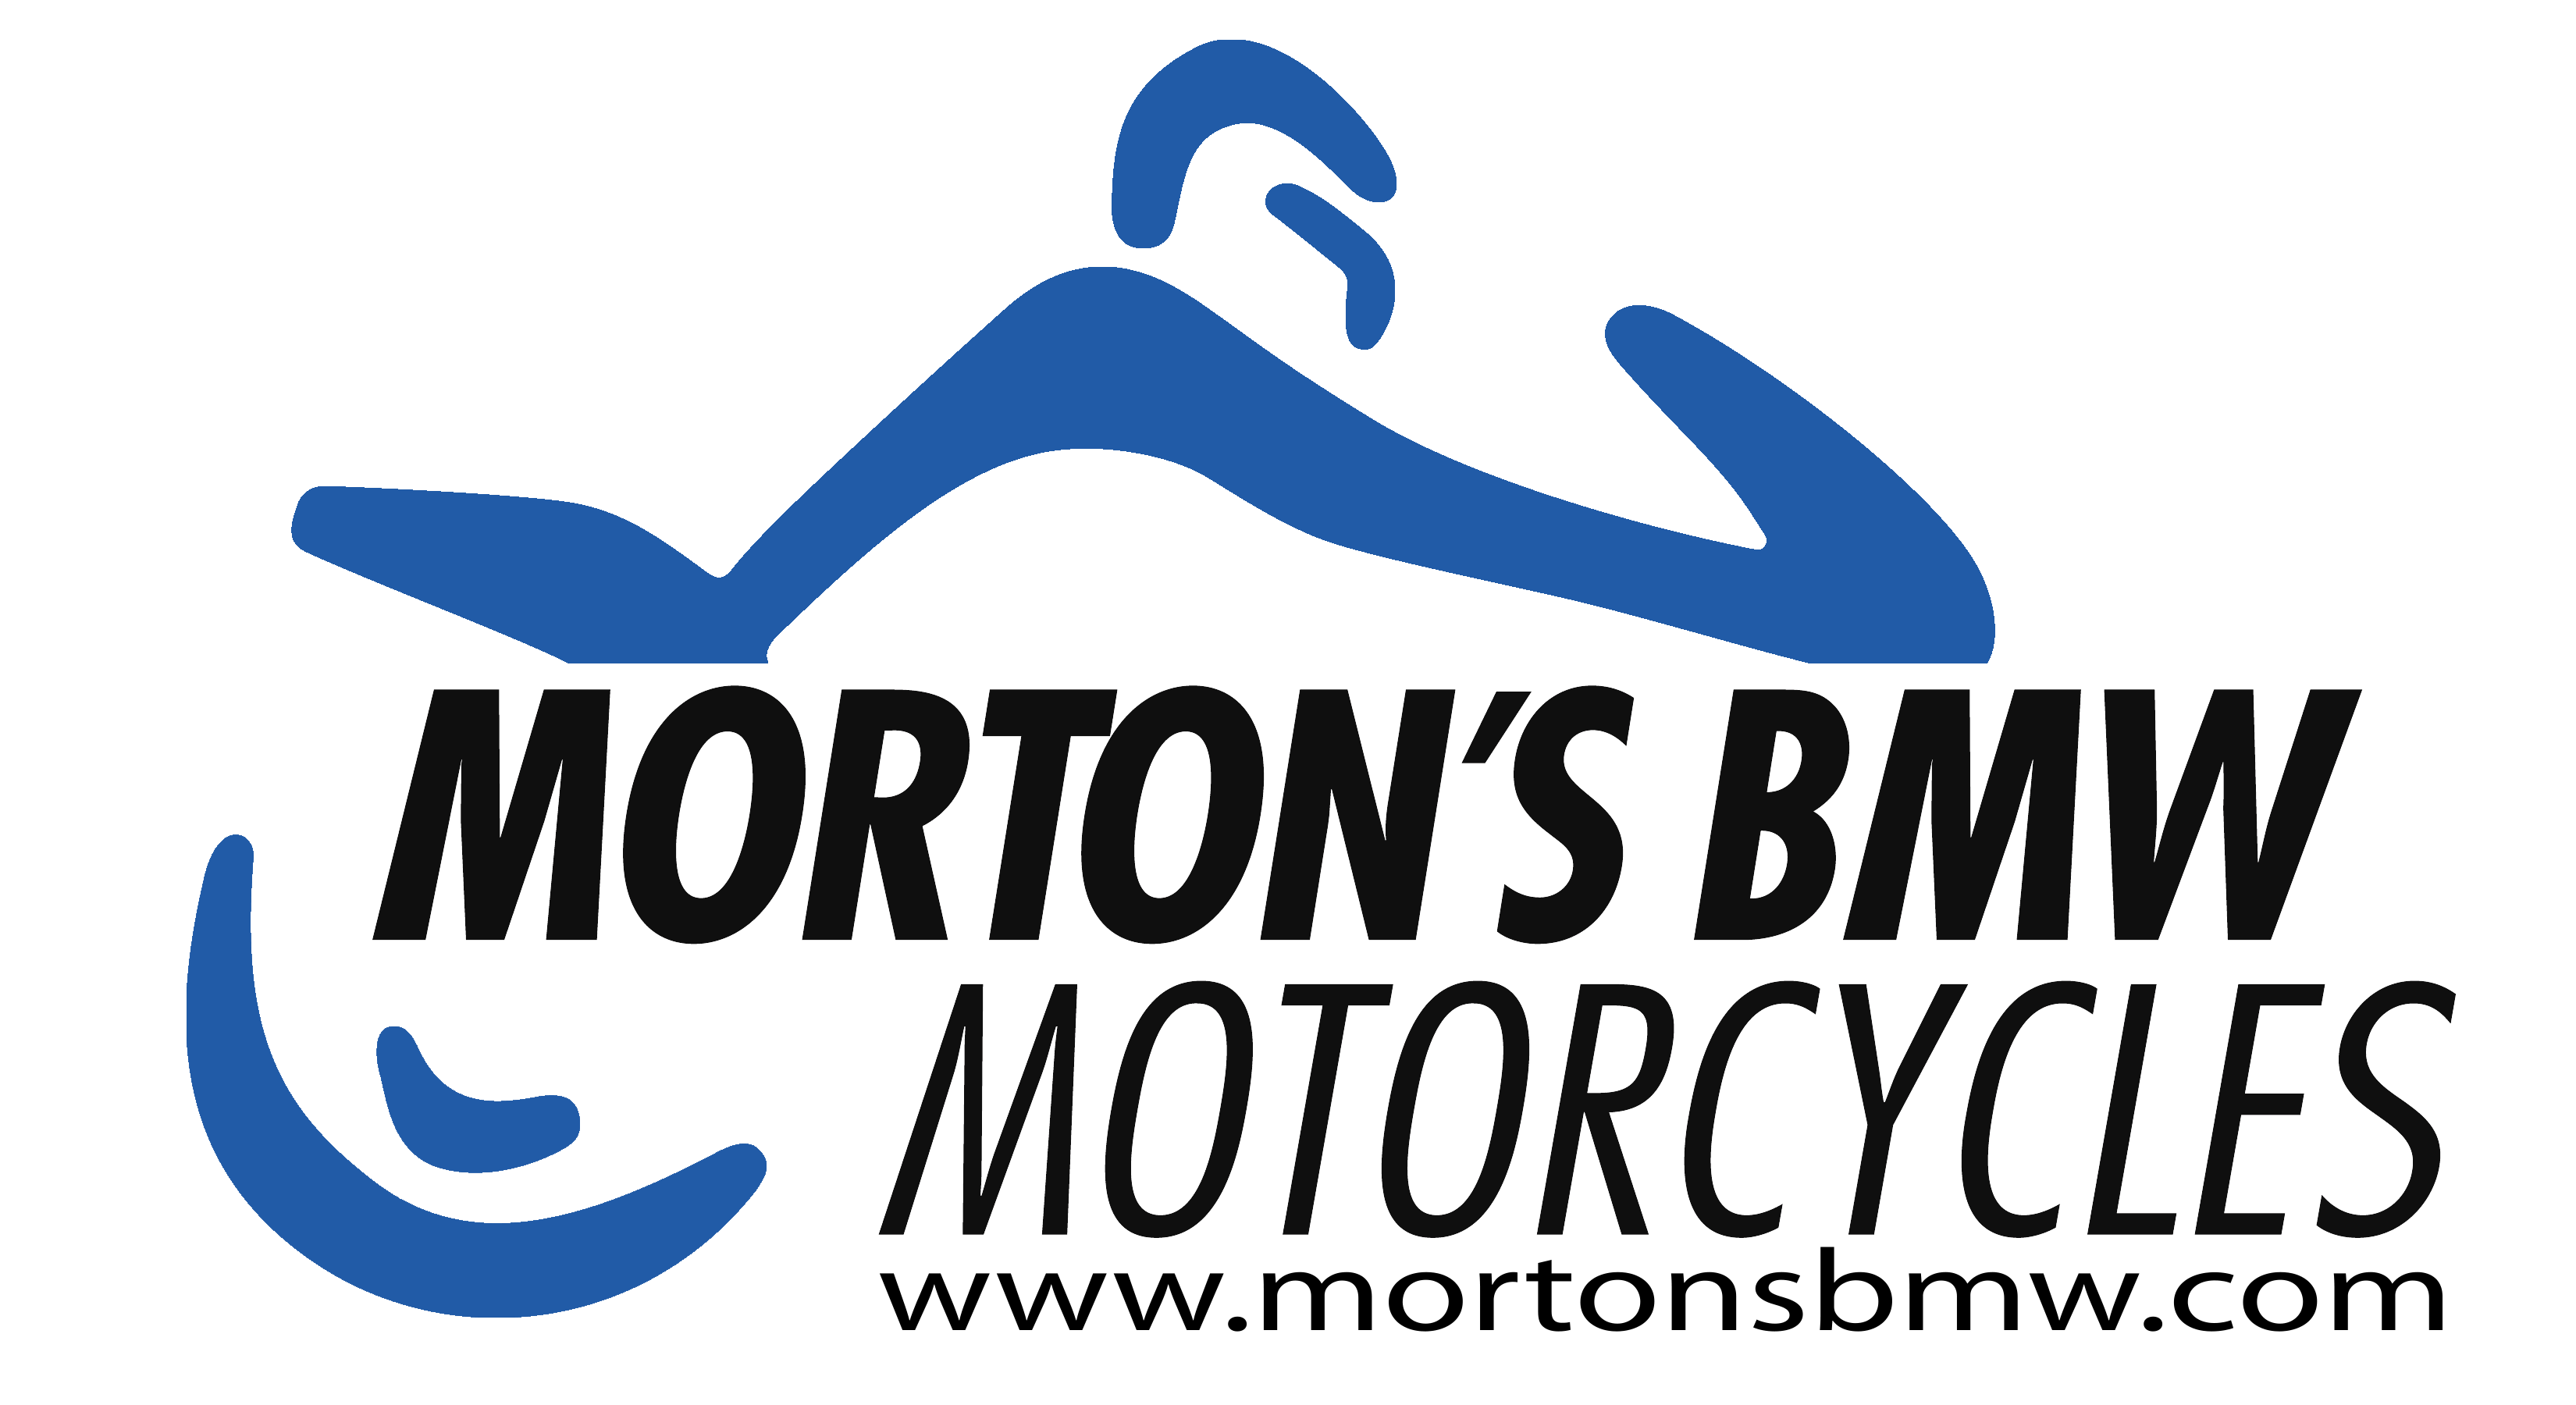 spring fling rally 2017 morton's bmw motorcycles fredericksburg